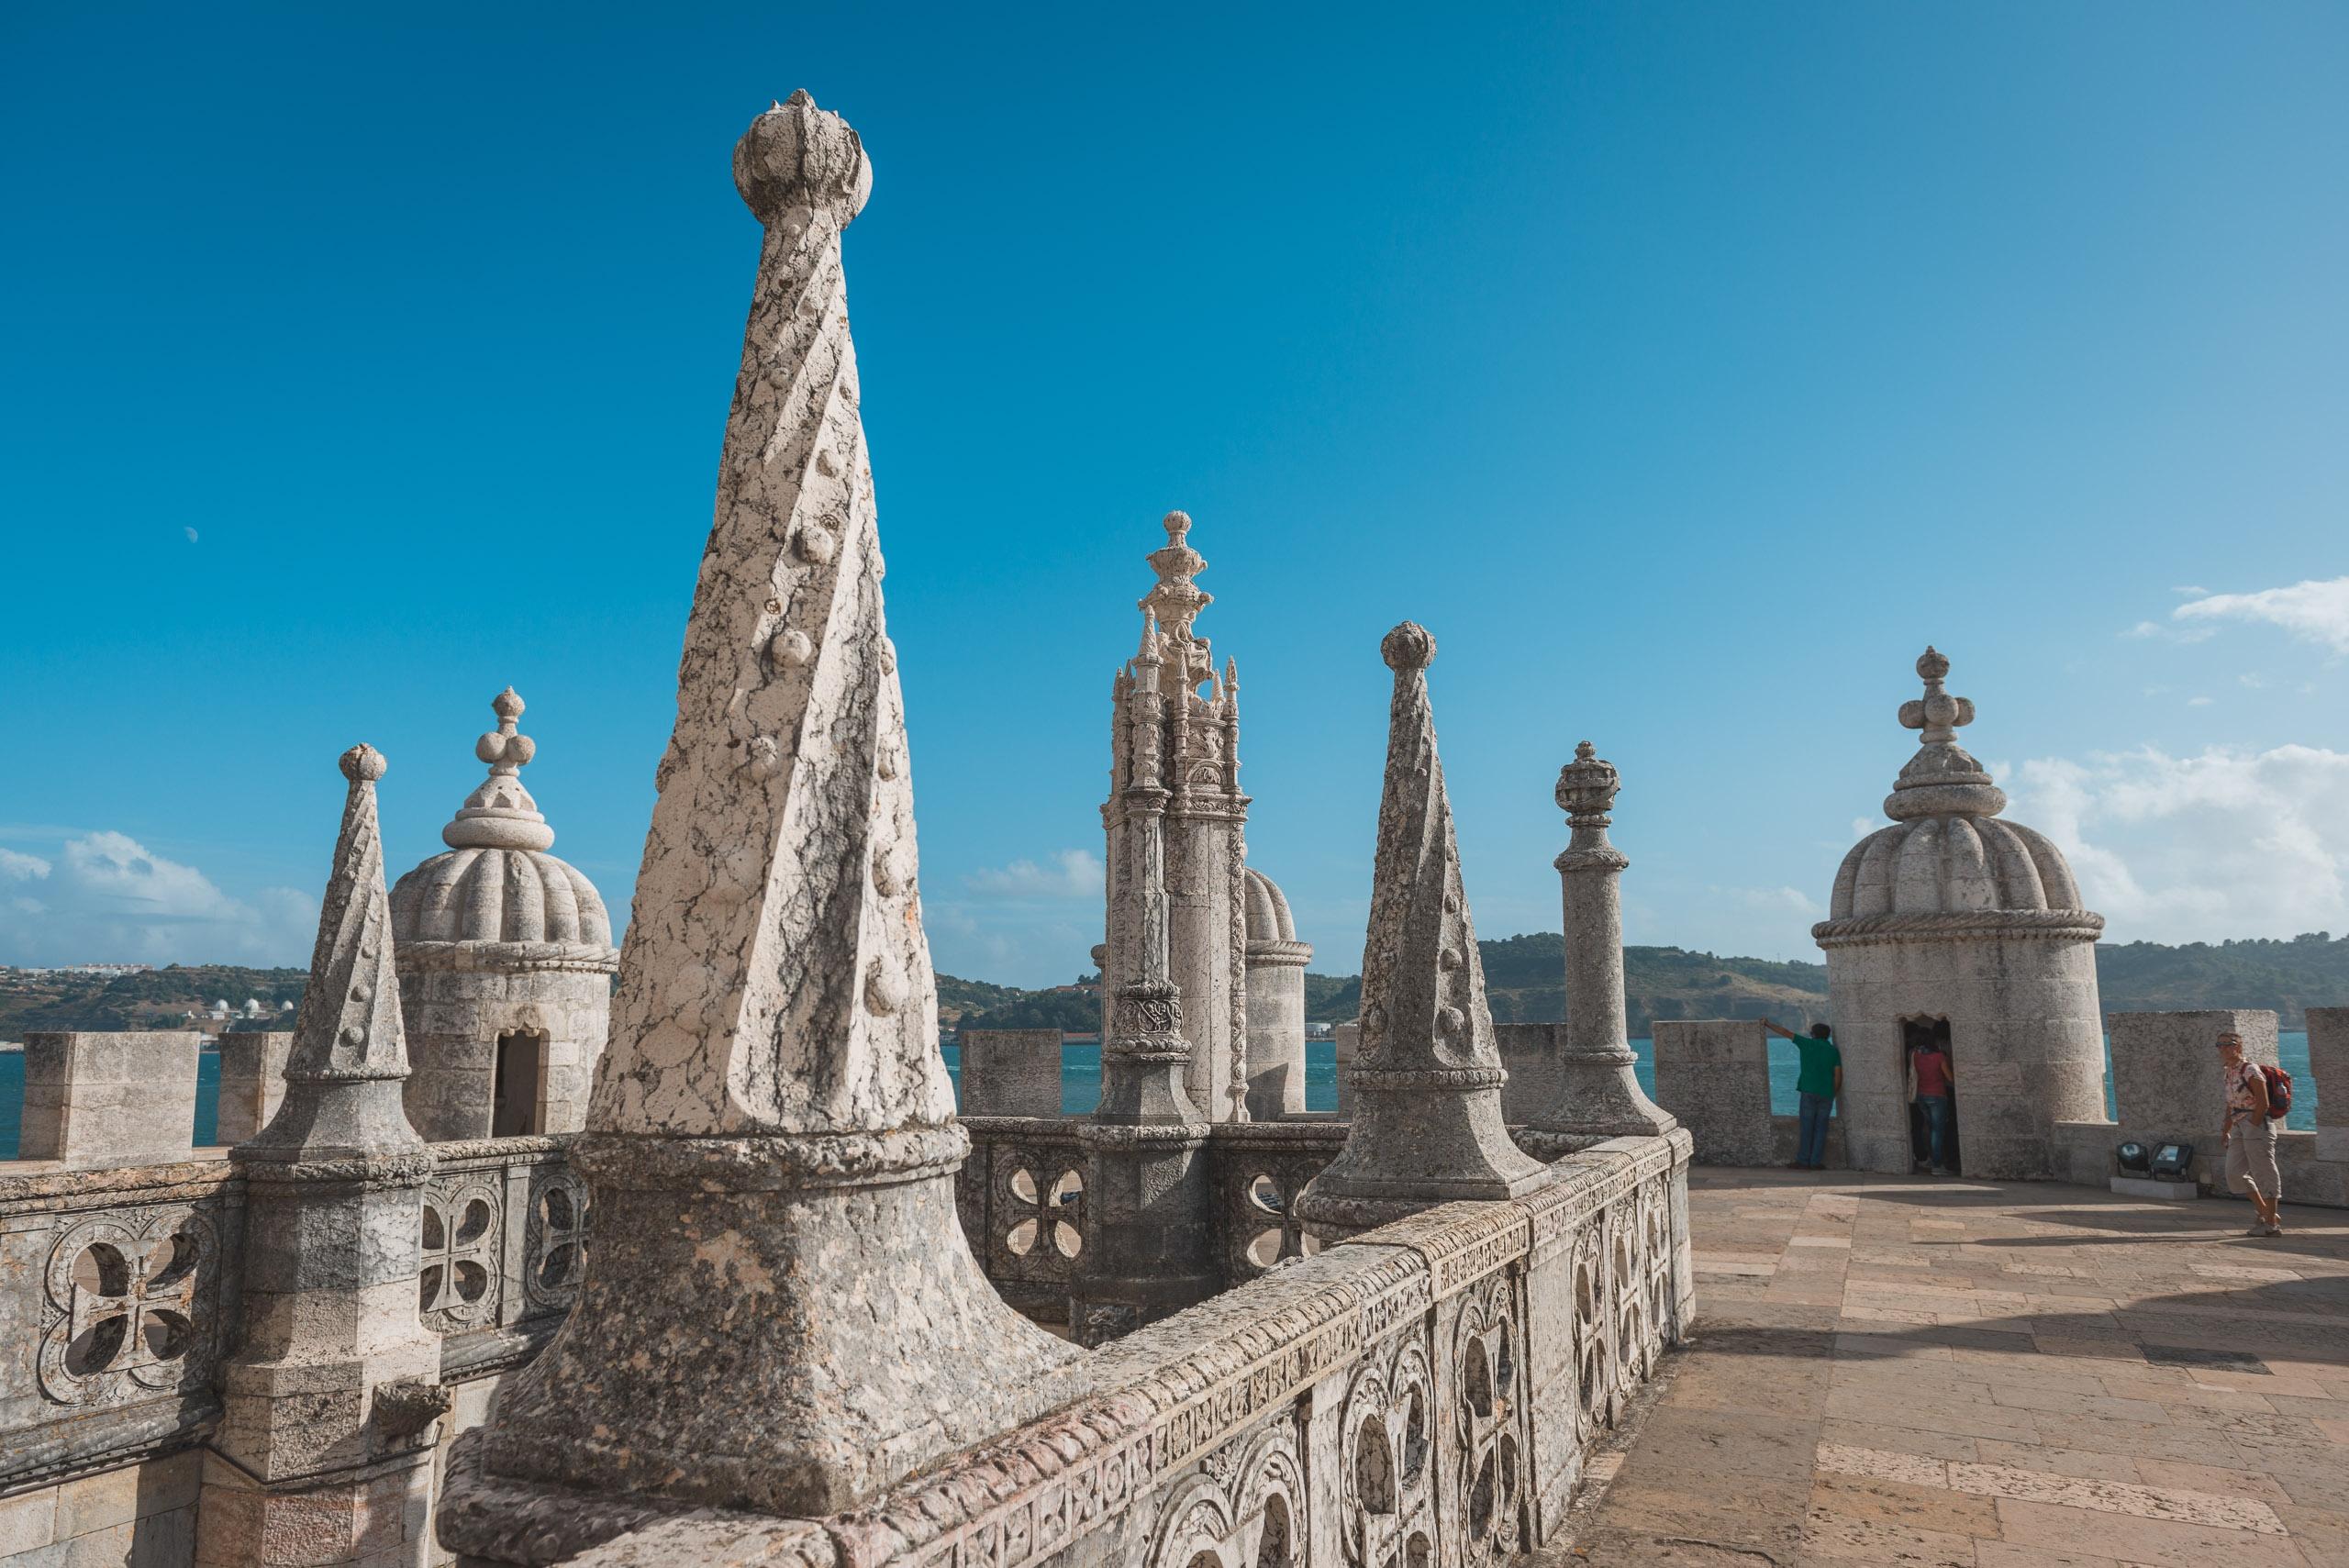 Portugal - Lisbon - 2012-0923-DSC_1567_118323